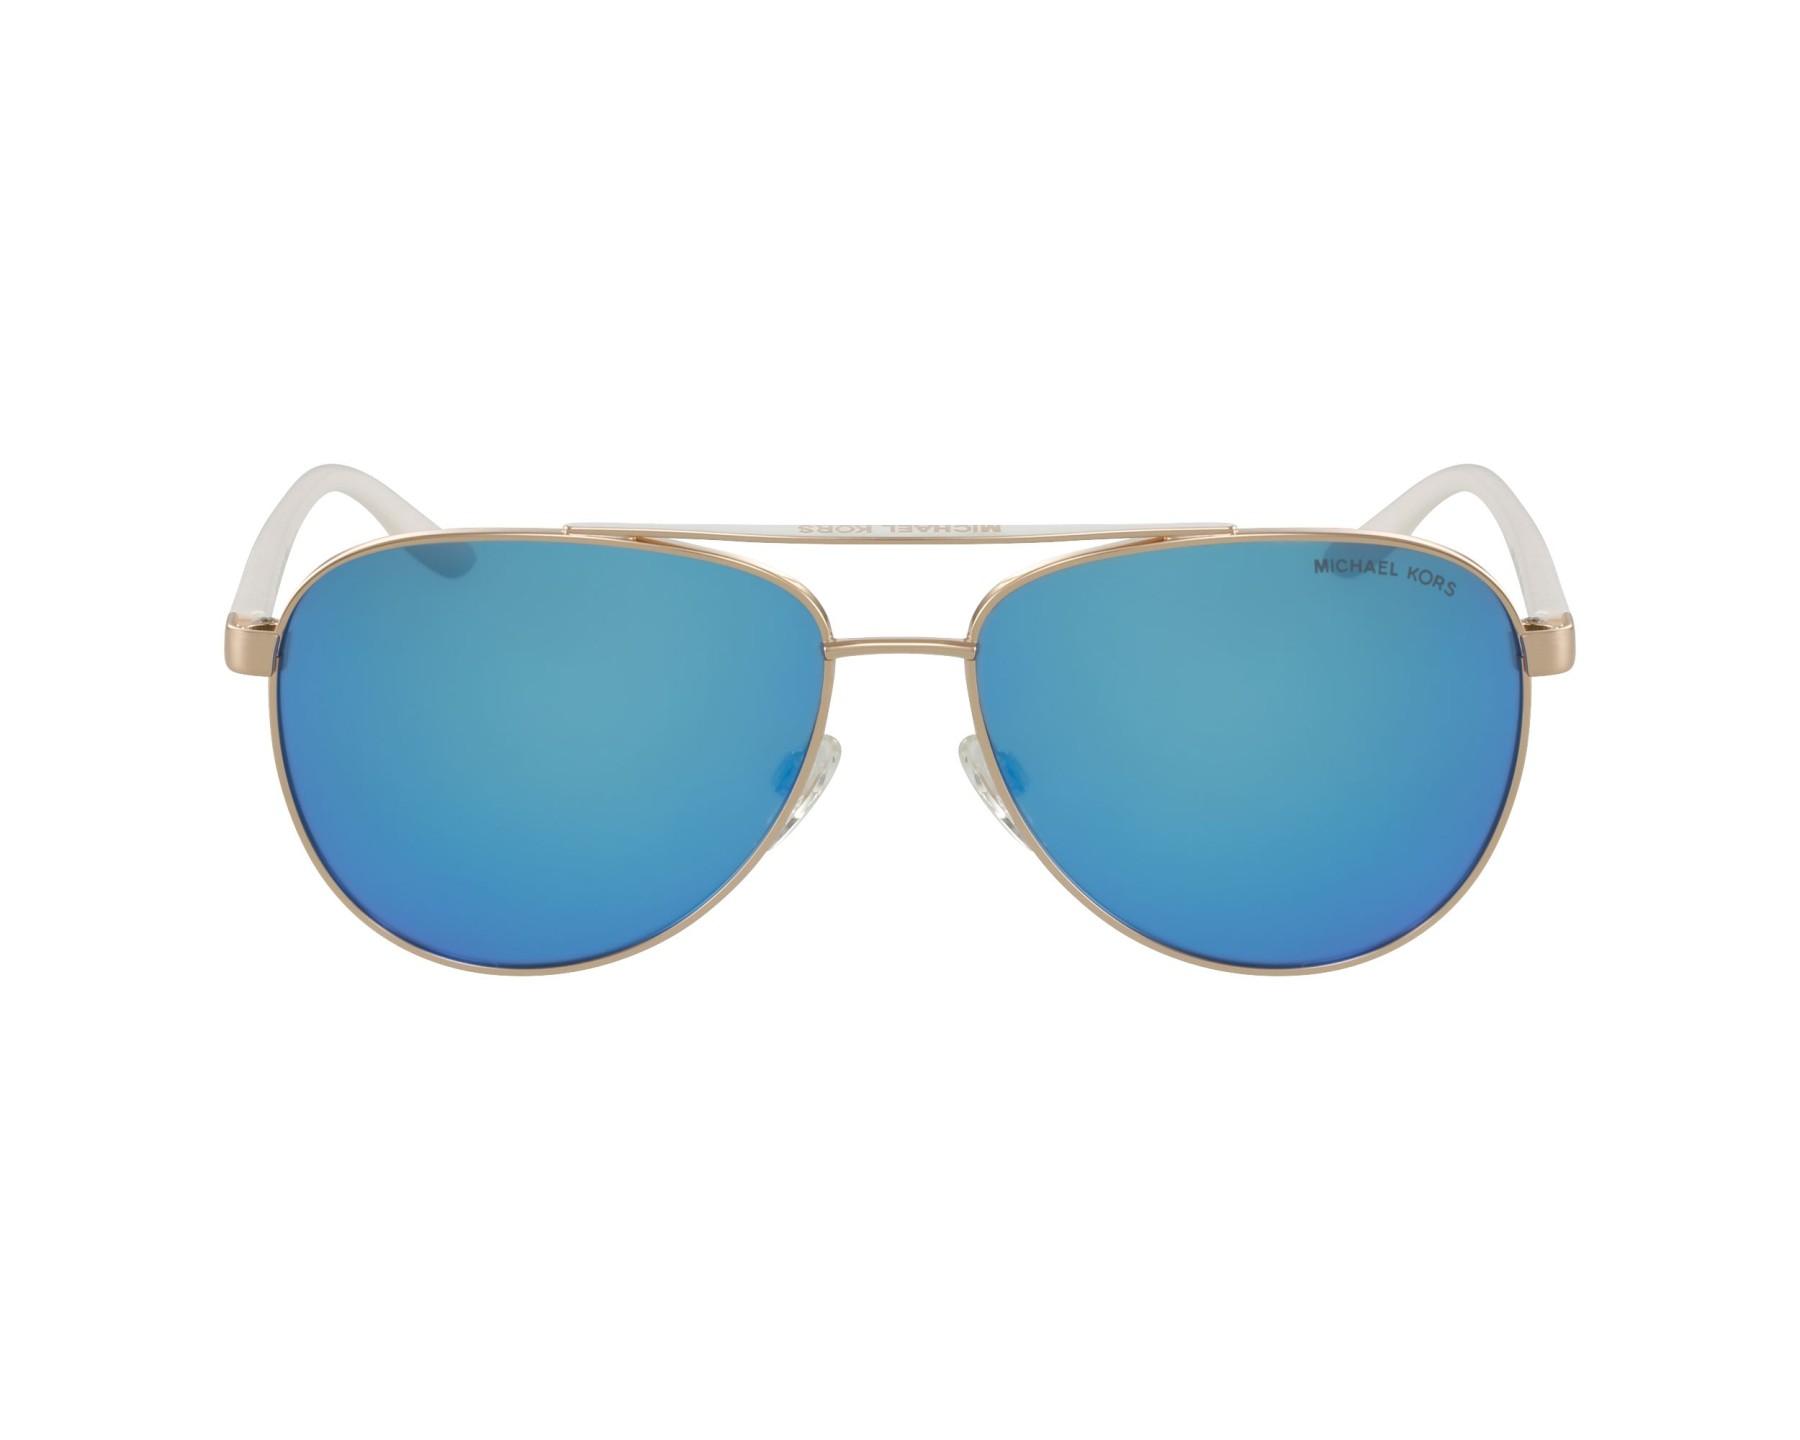 2e3bef6e7d Sunglasses Michael Kors MK-5007 104525 - Gold White profile view